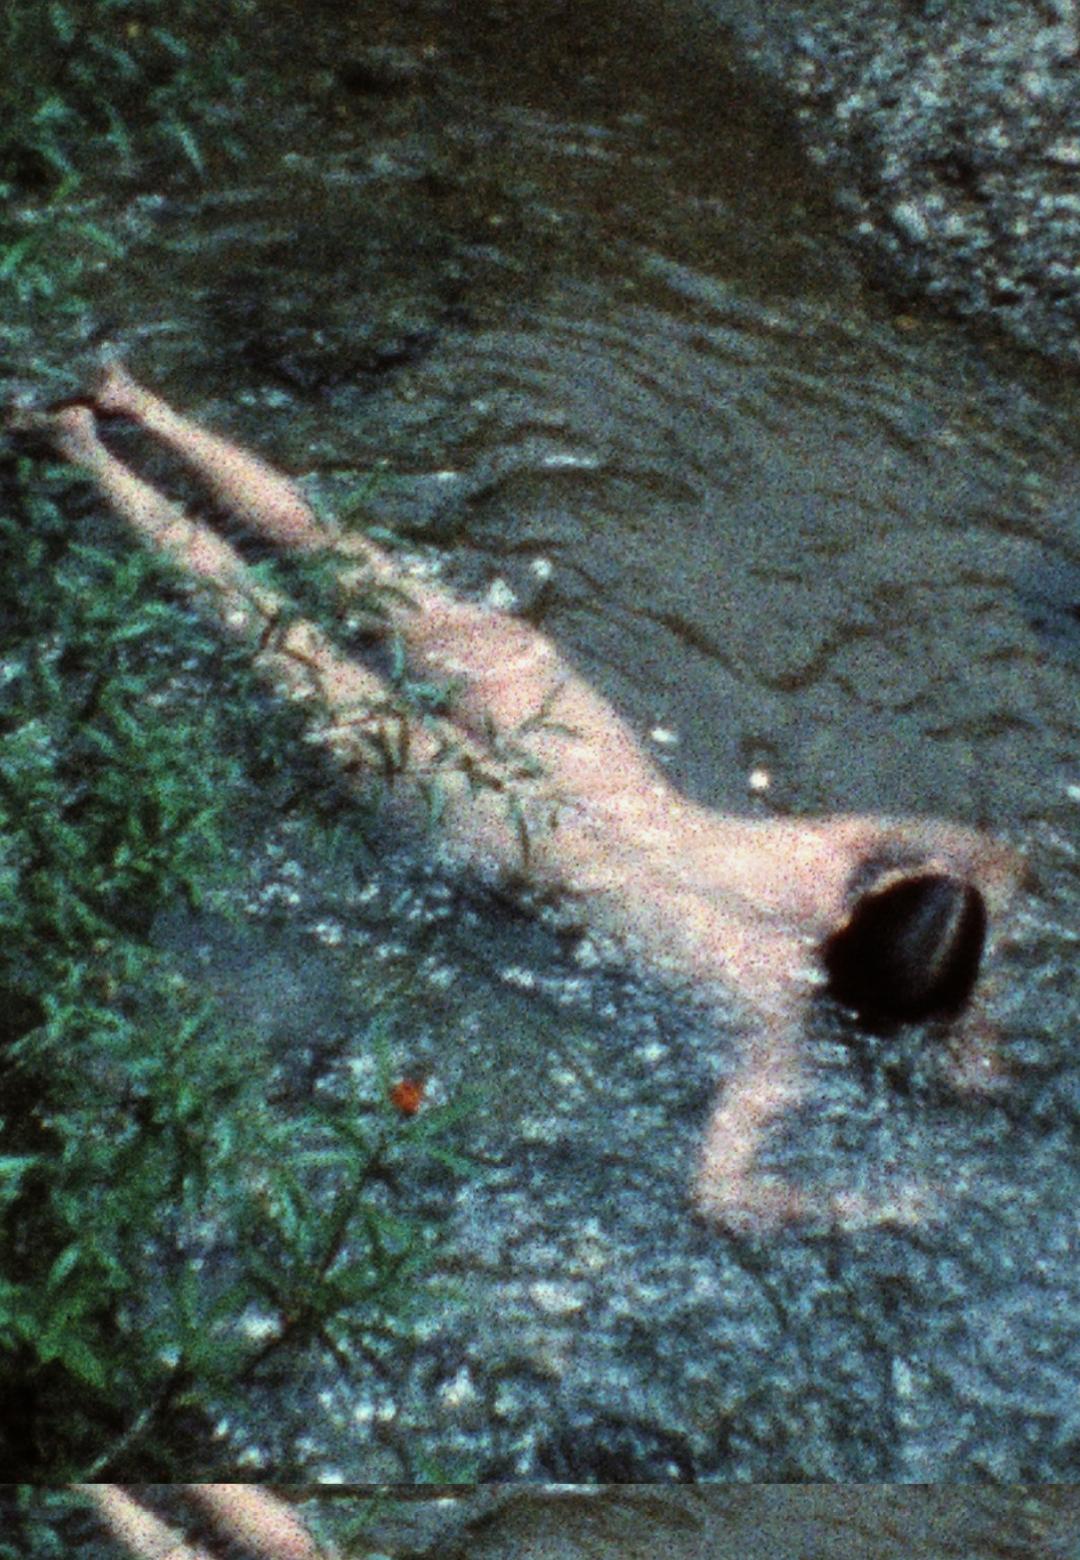 Ana Mendieta, Creek, 1974, Super-8mm film transferred to high-definition digital media, colour, silent. Running time: 3:11 minutes | Earthbound | Ana Mendieta | STIR